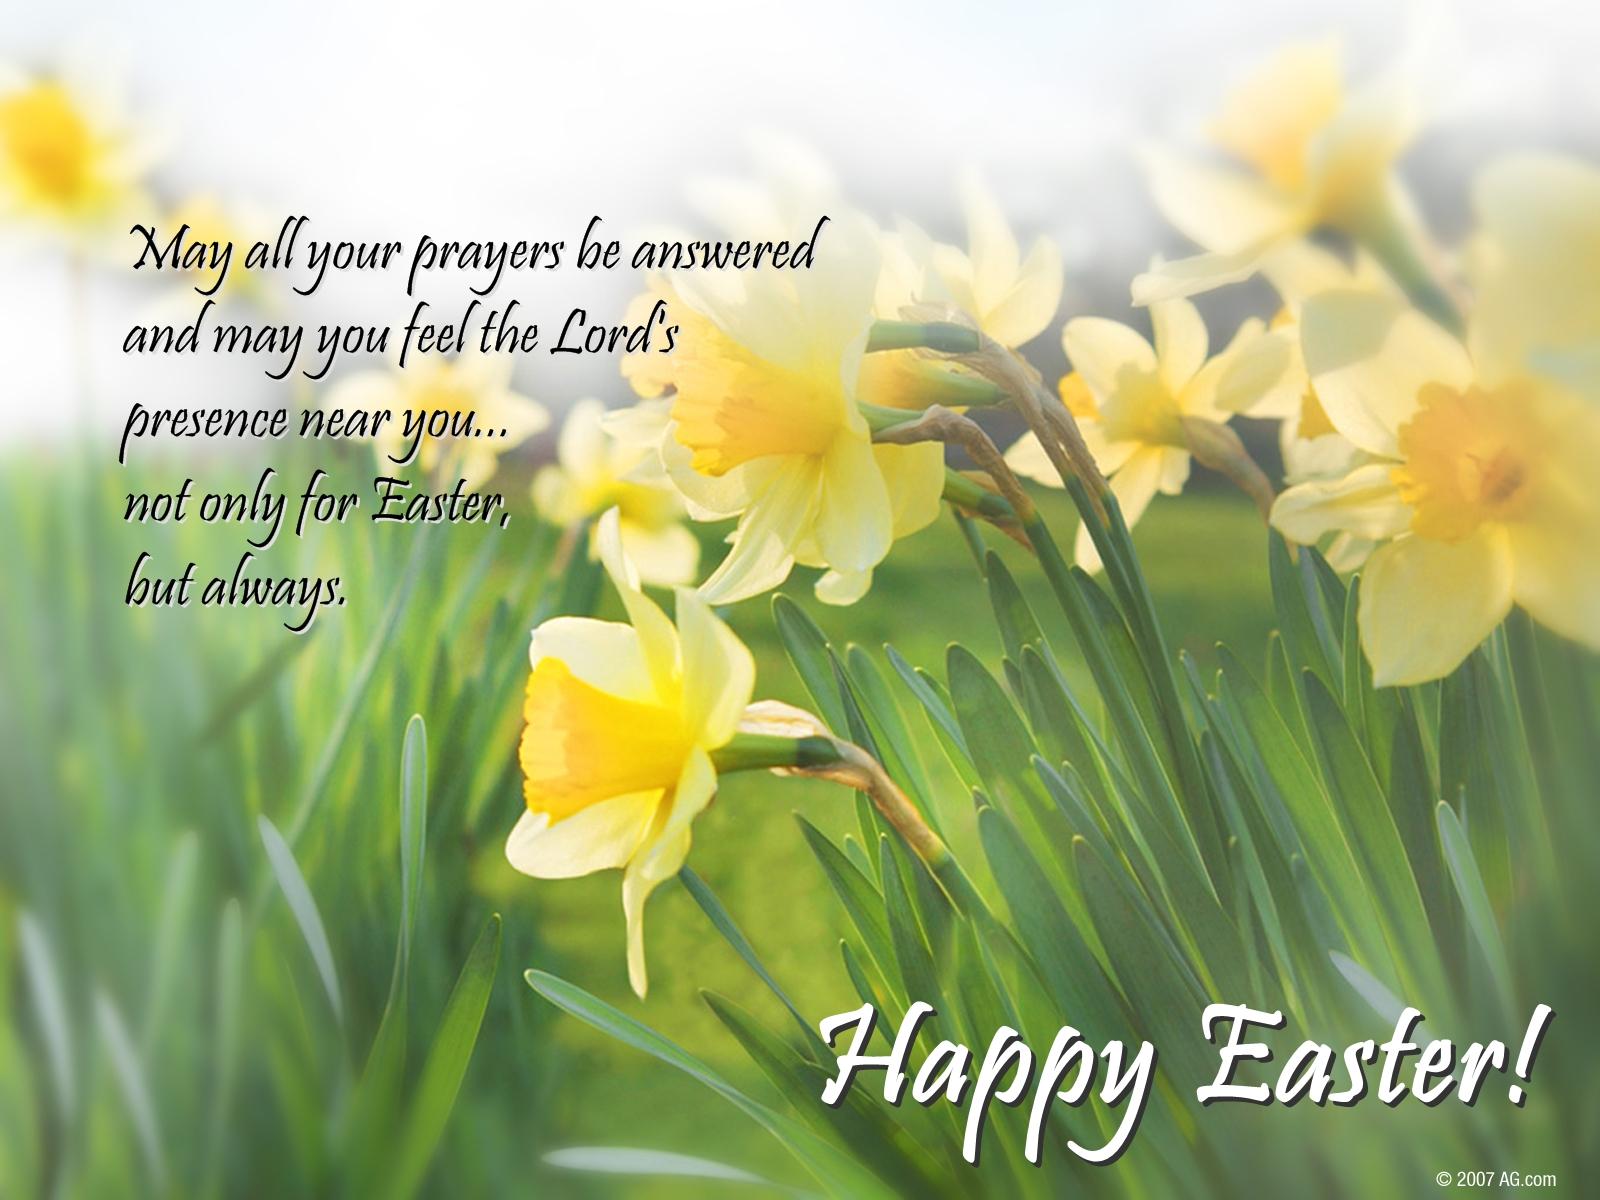 [44+] Easter Blessings Wallpaper on WallpaperSafari Easter Clip Art Free Sayings